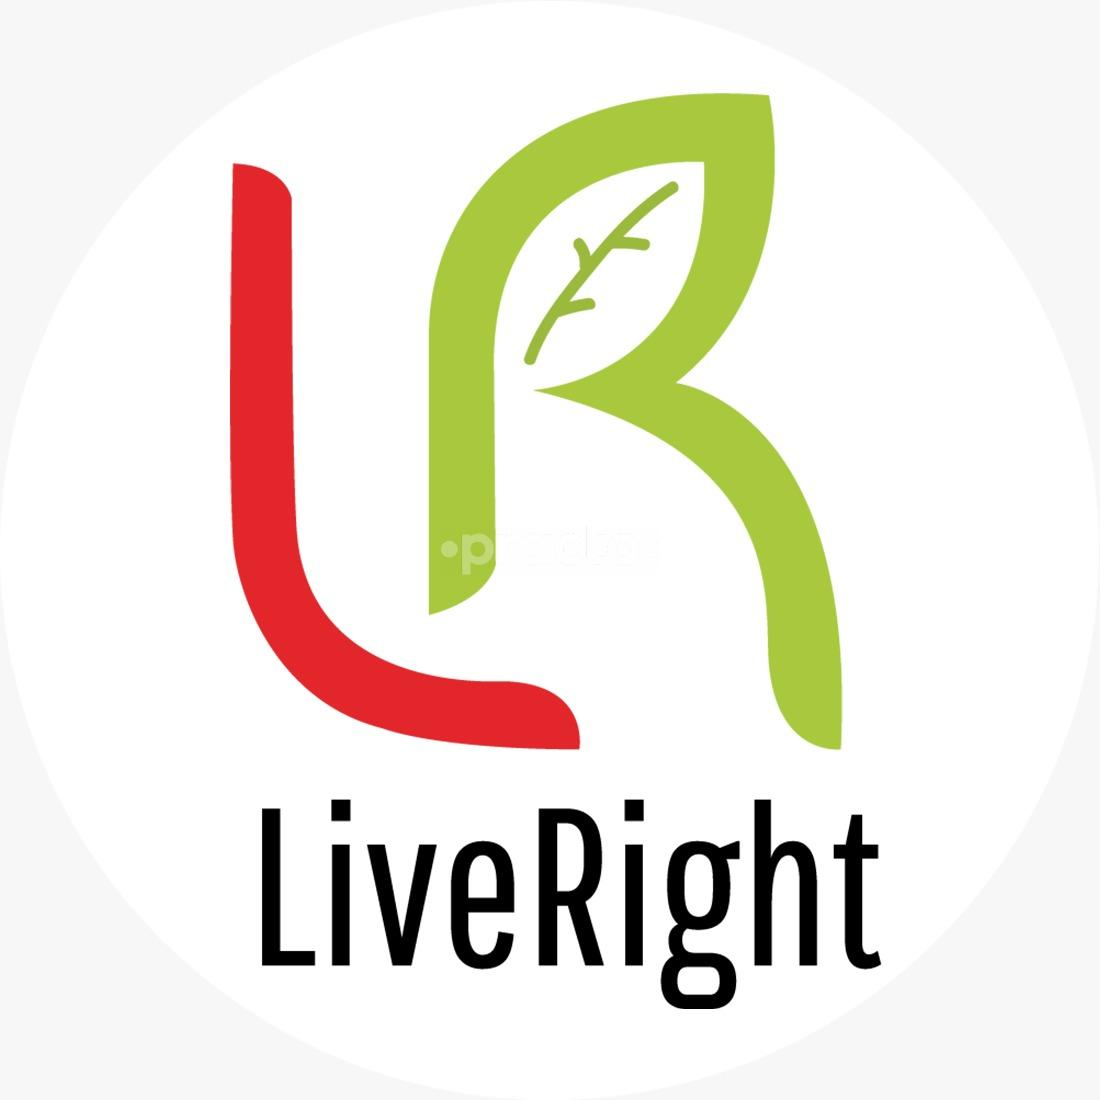 LiveRight Ayurveda